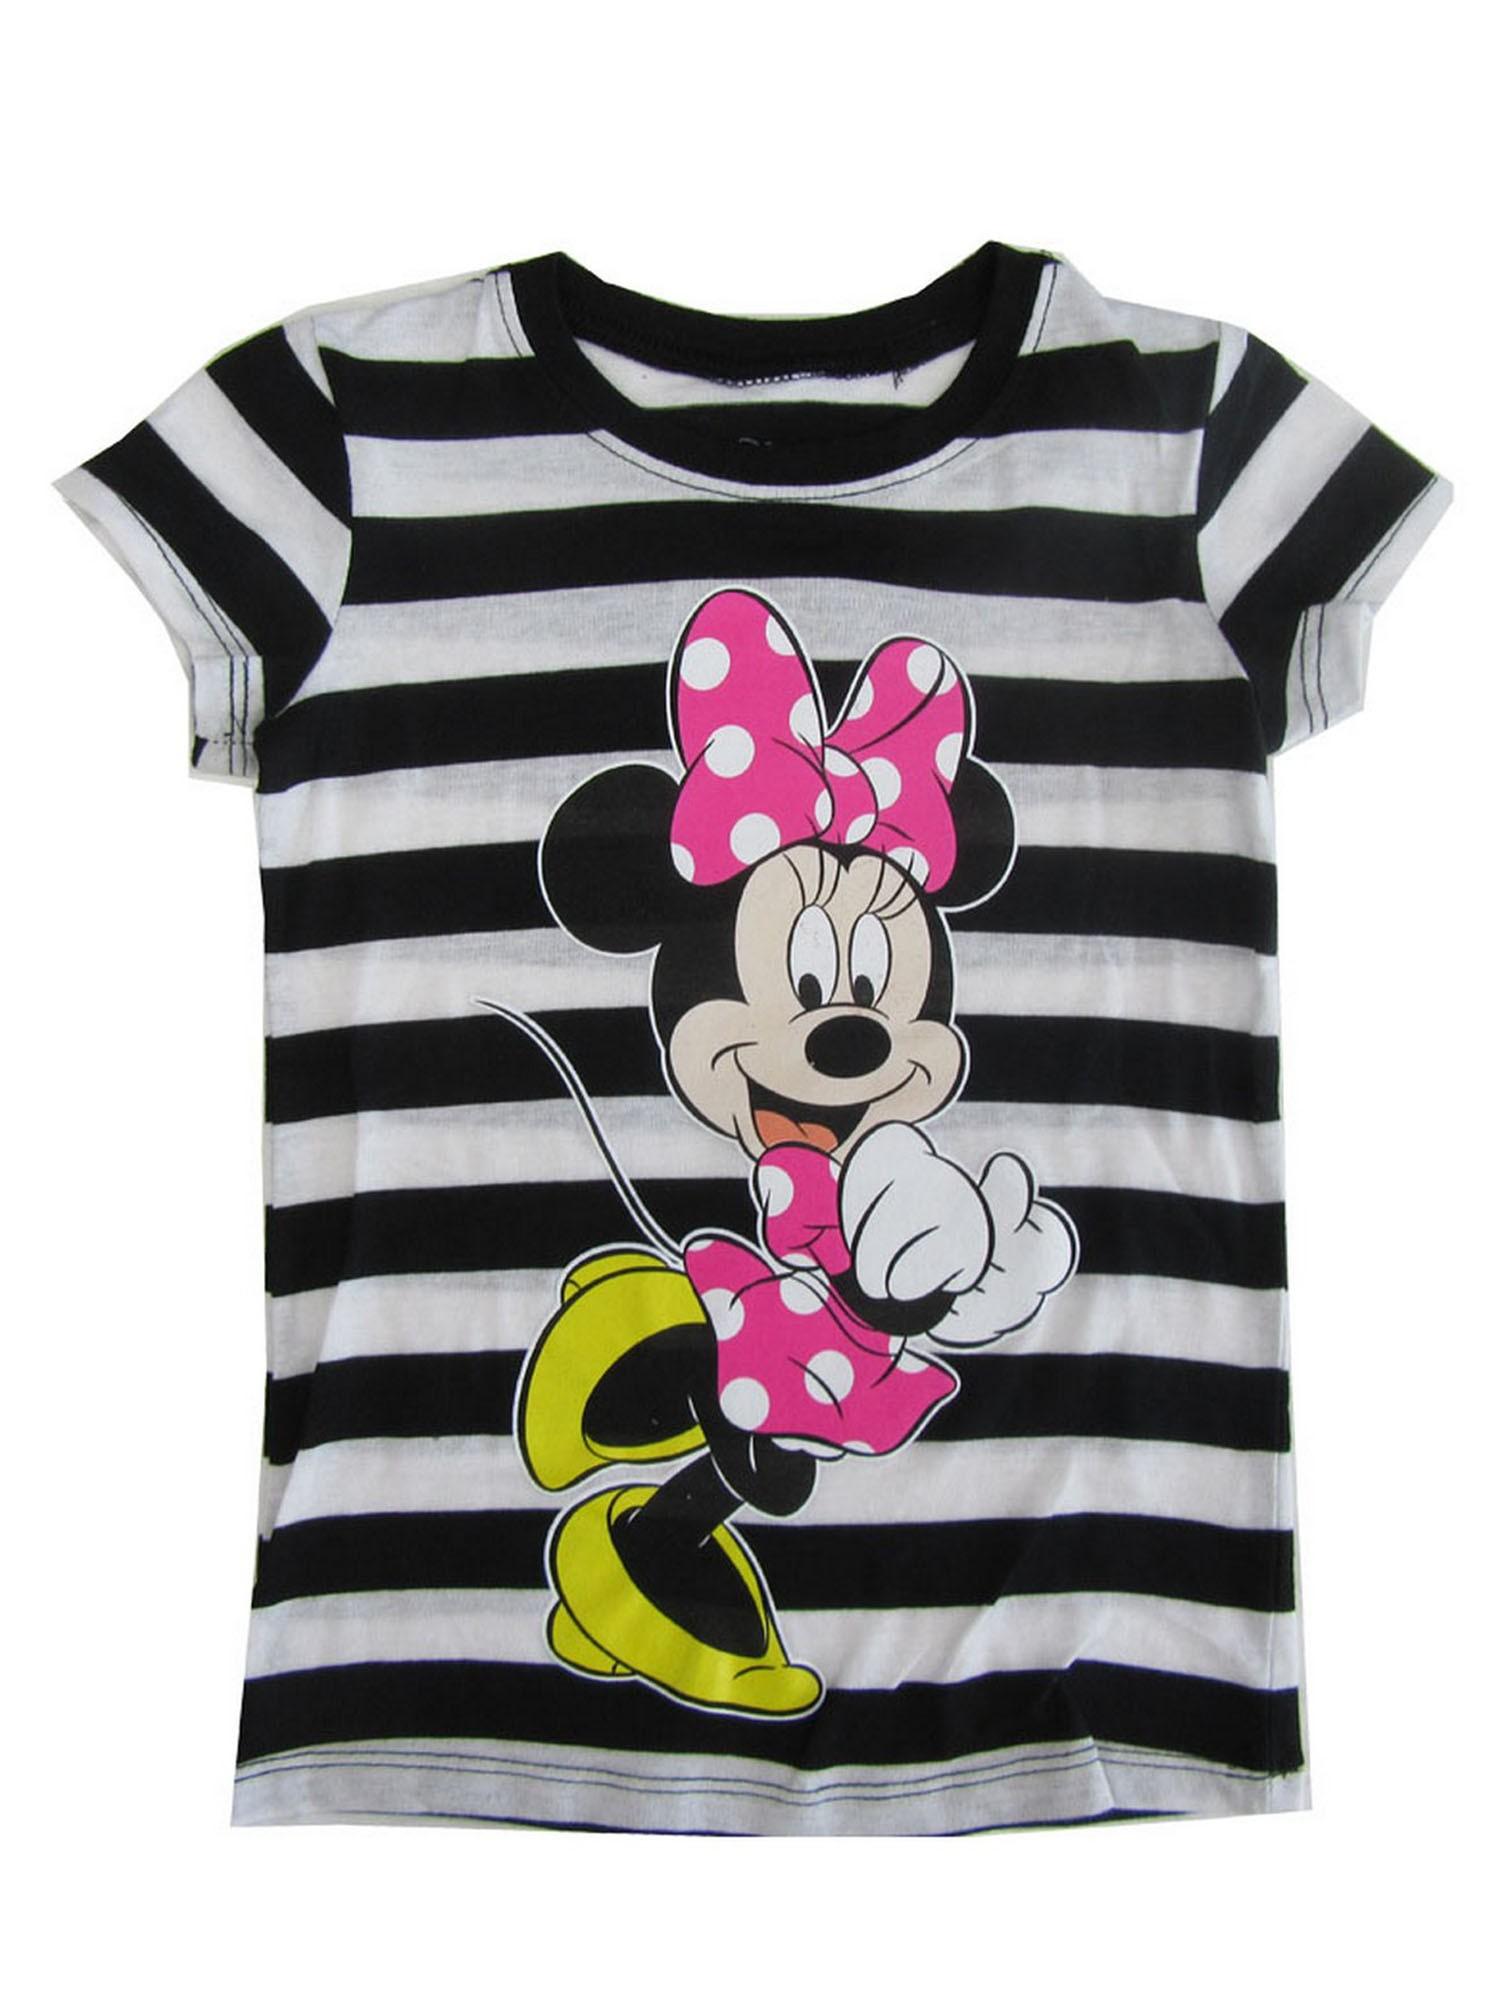 Disney Girls Black White Stripe Minnie Mouse Print Cotton T-Shirt